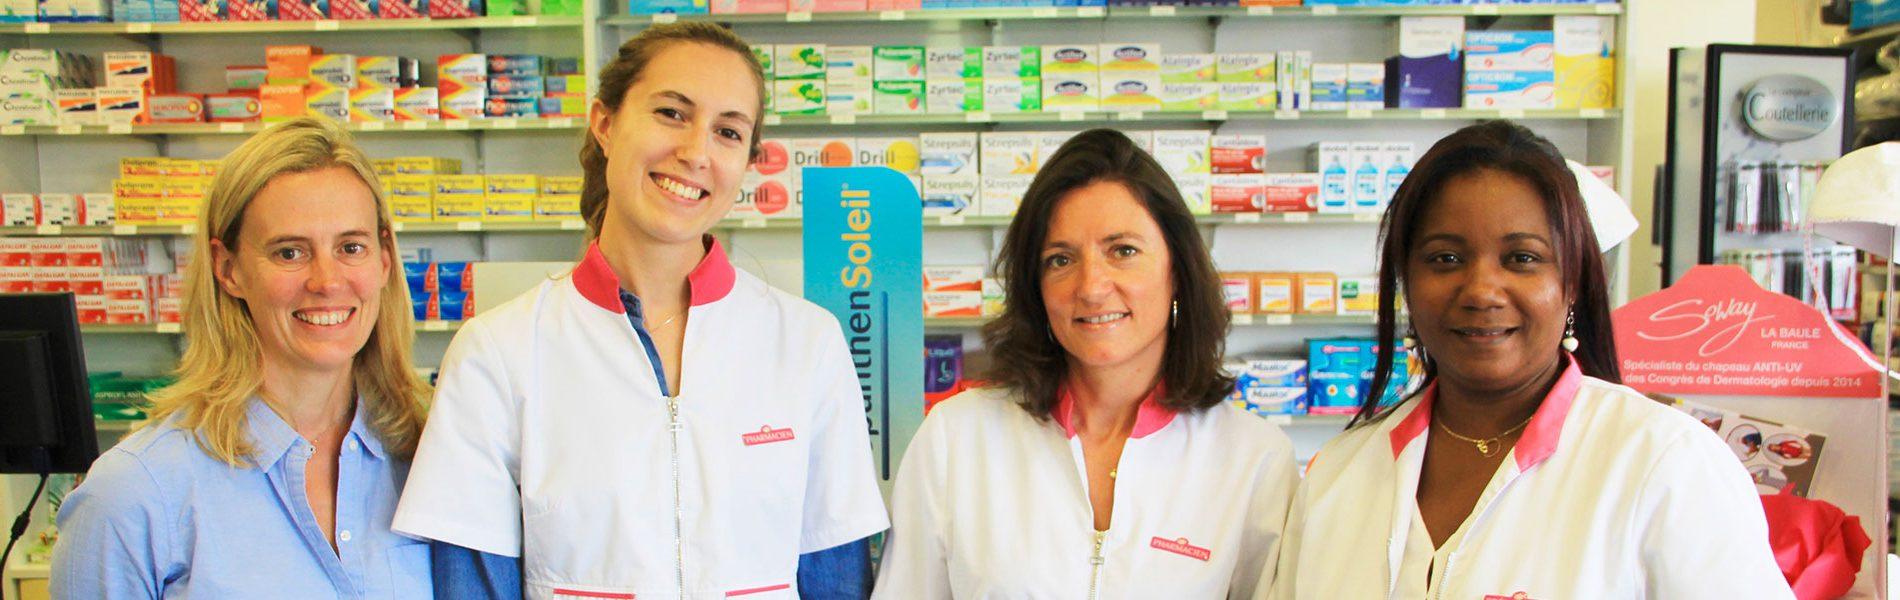 Pharmacie BONNET - Image Homepage 3